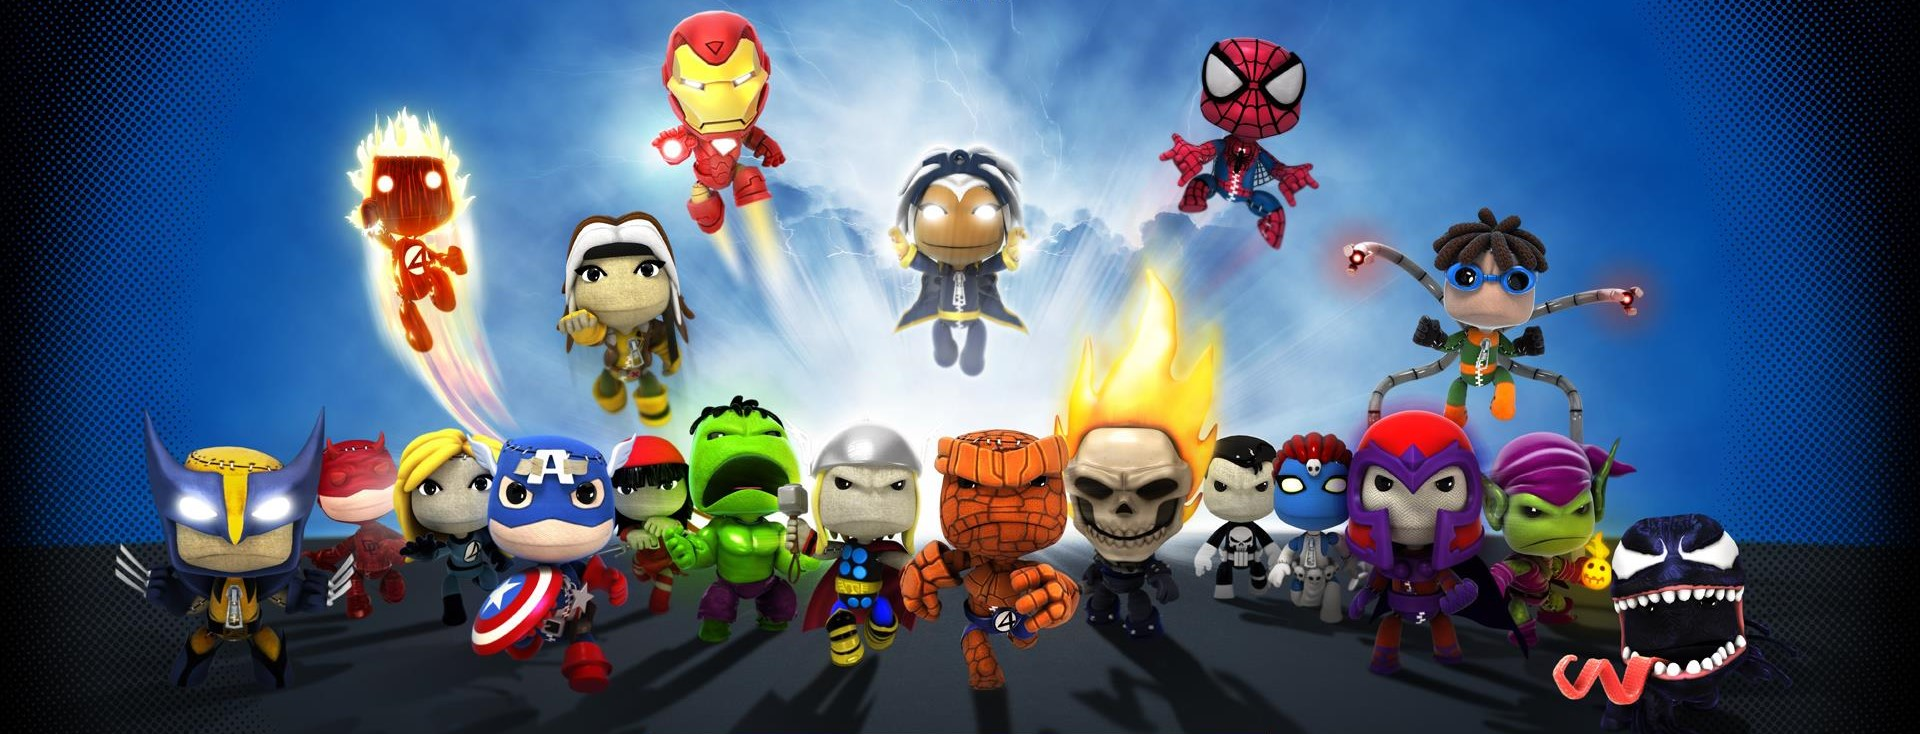 LittleBigPlanet_ Marvel Arcade